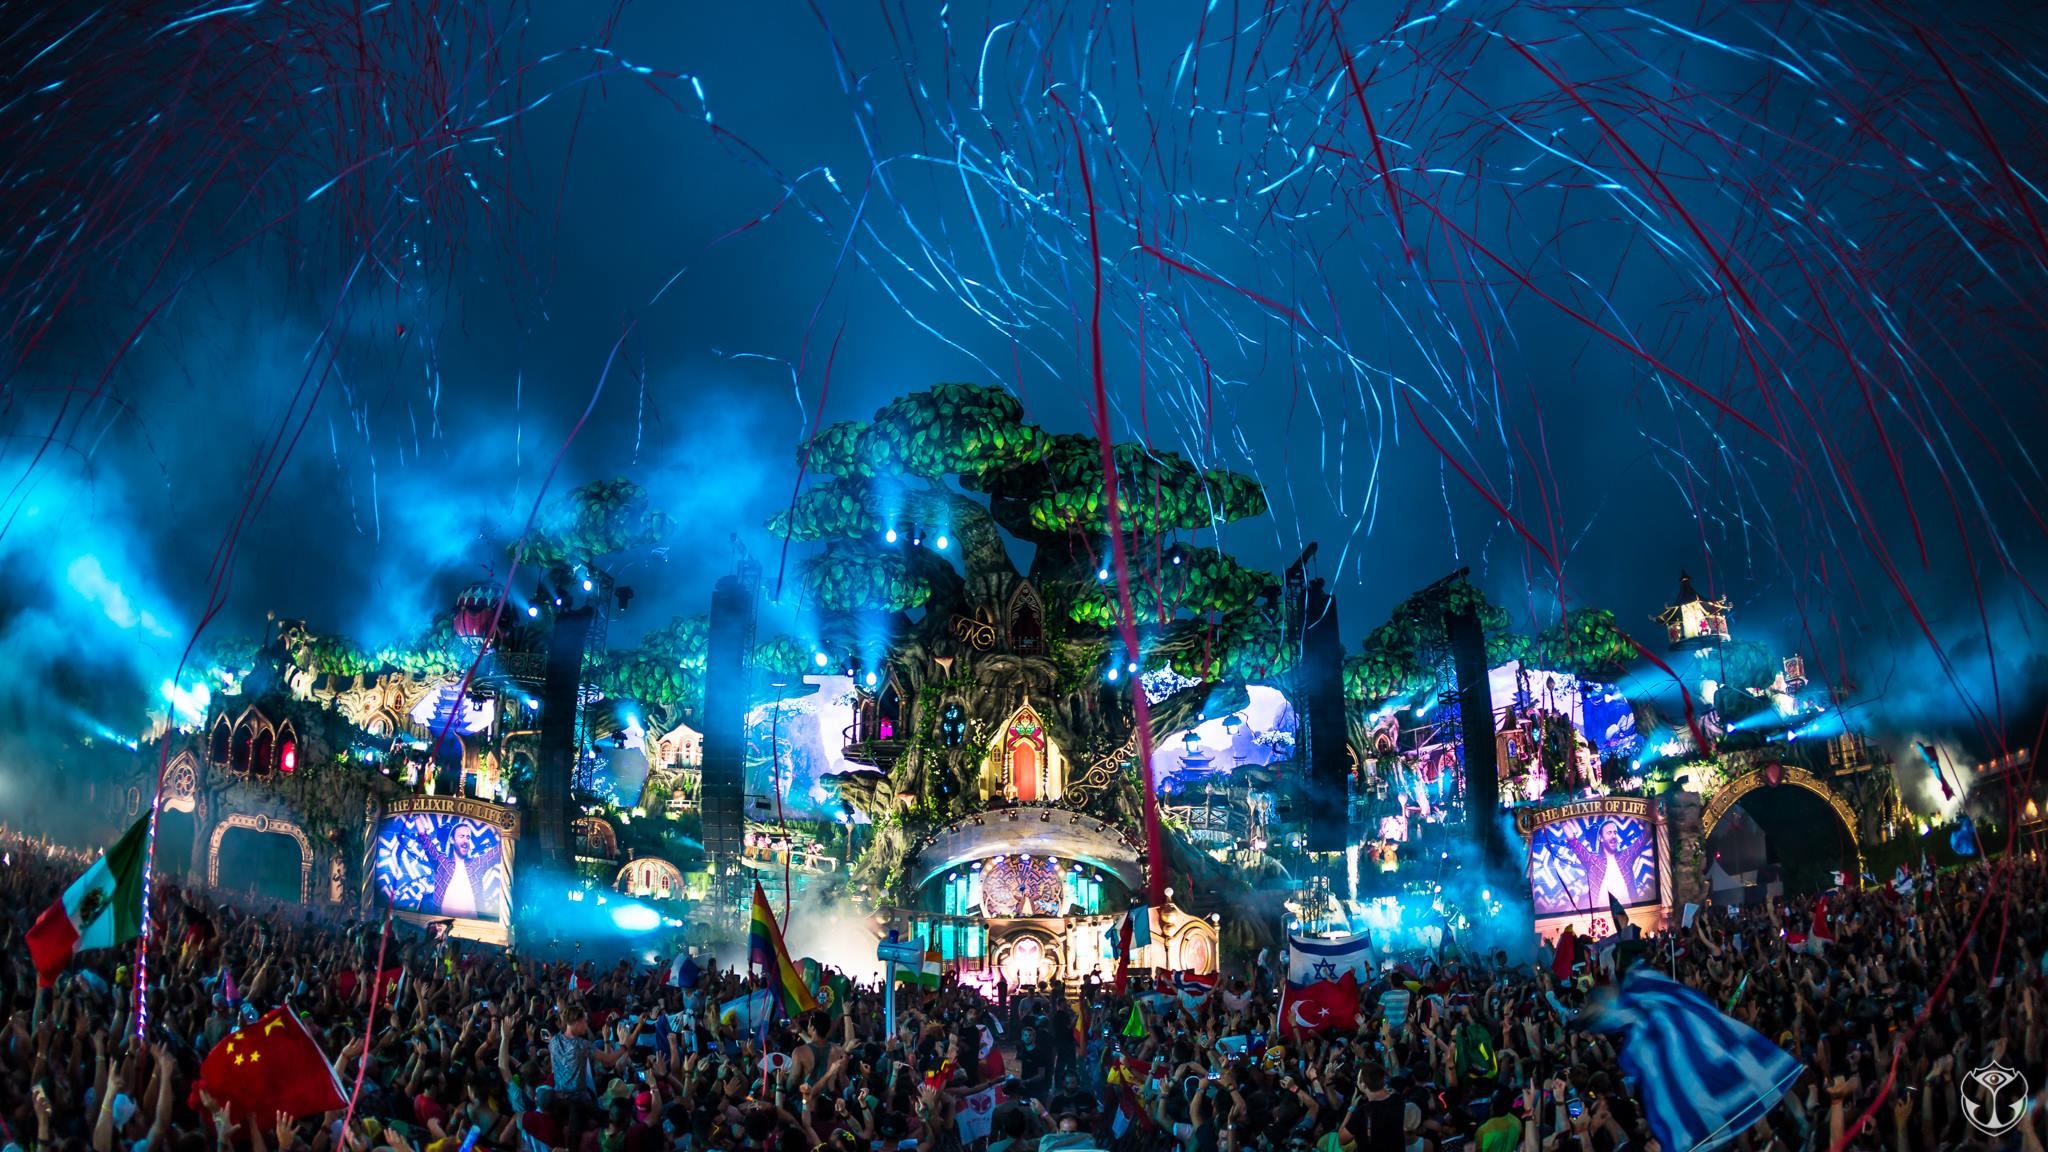 Tomorrowland 2018 Wallpapers Top Free Tomorrowland 2018